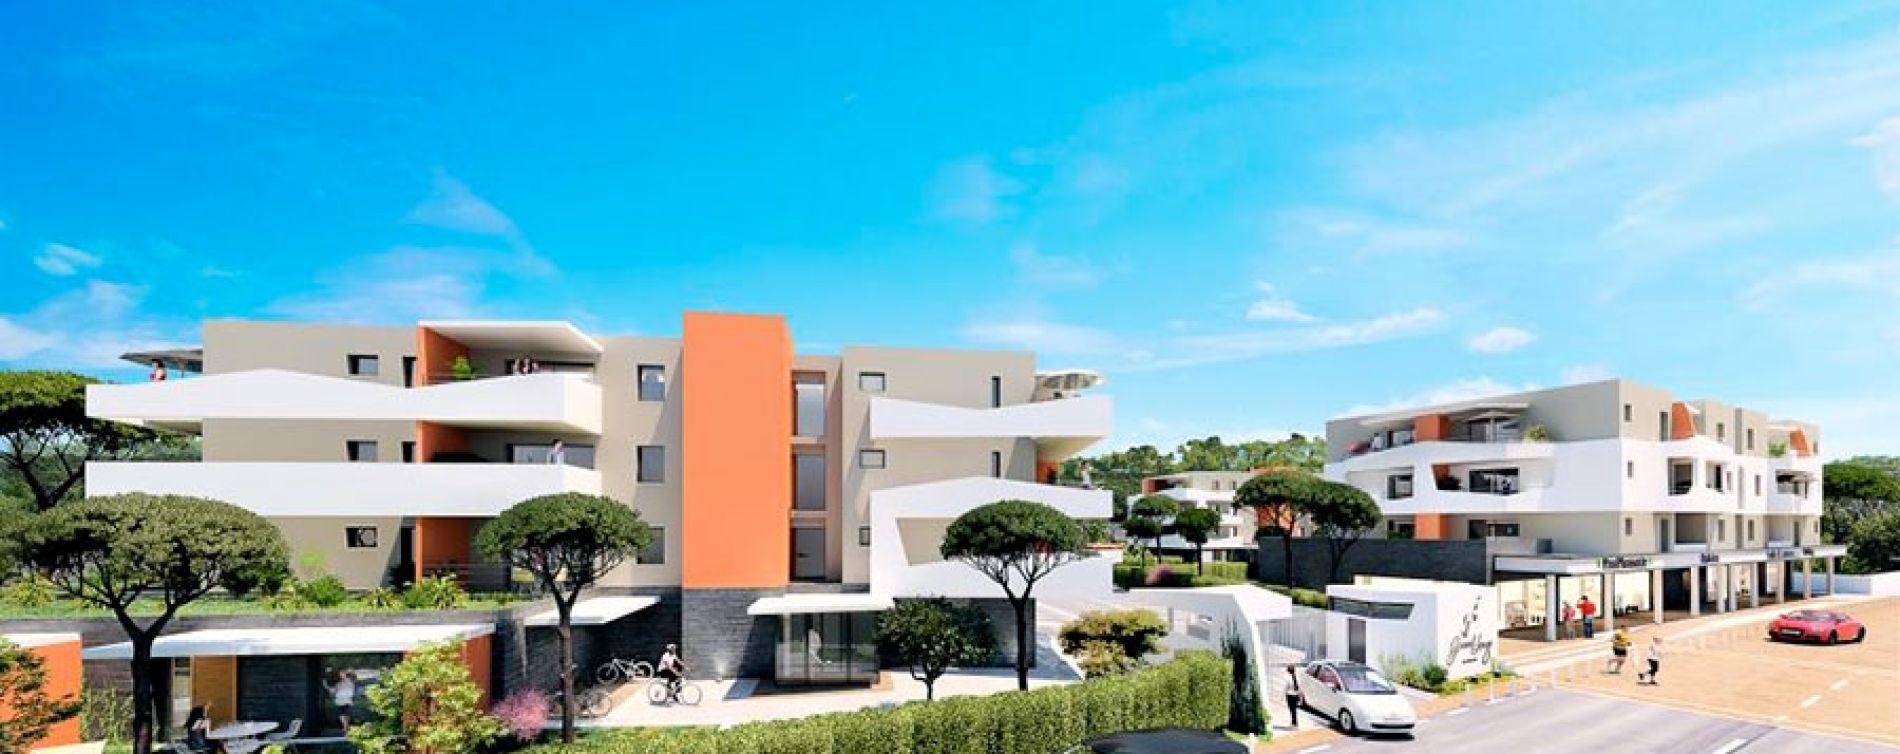 Résidence Grand Large - Bât. B-C-D à Sérignan